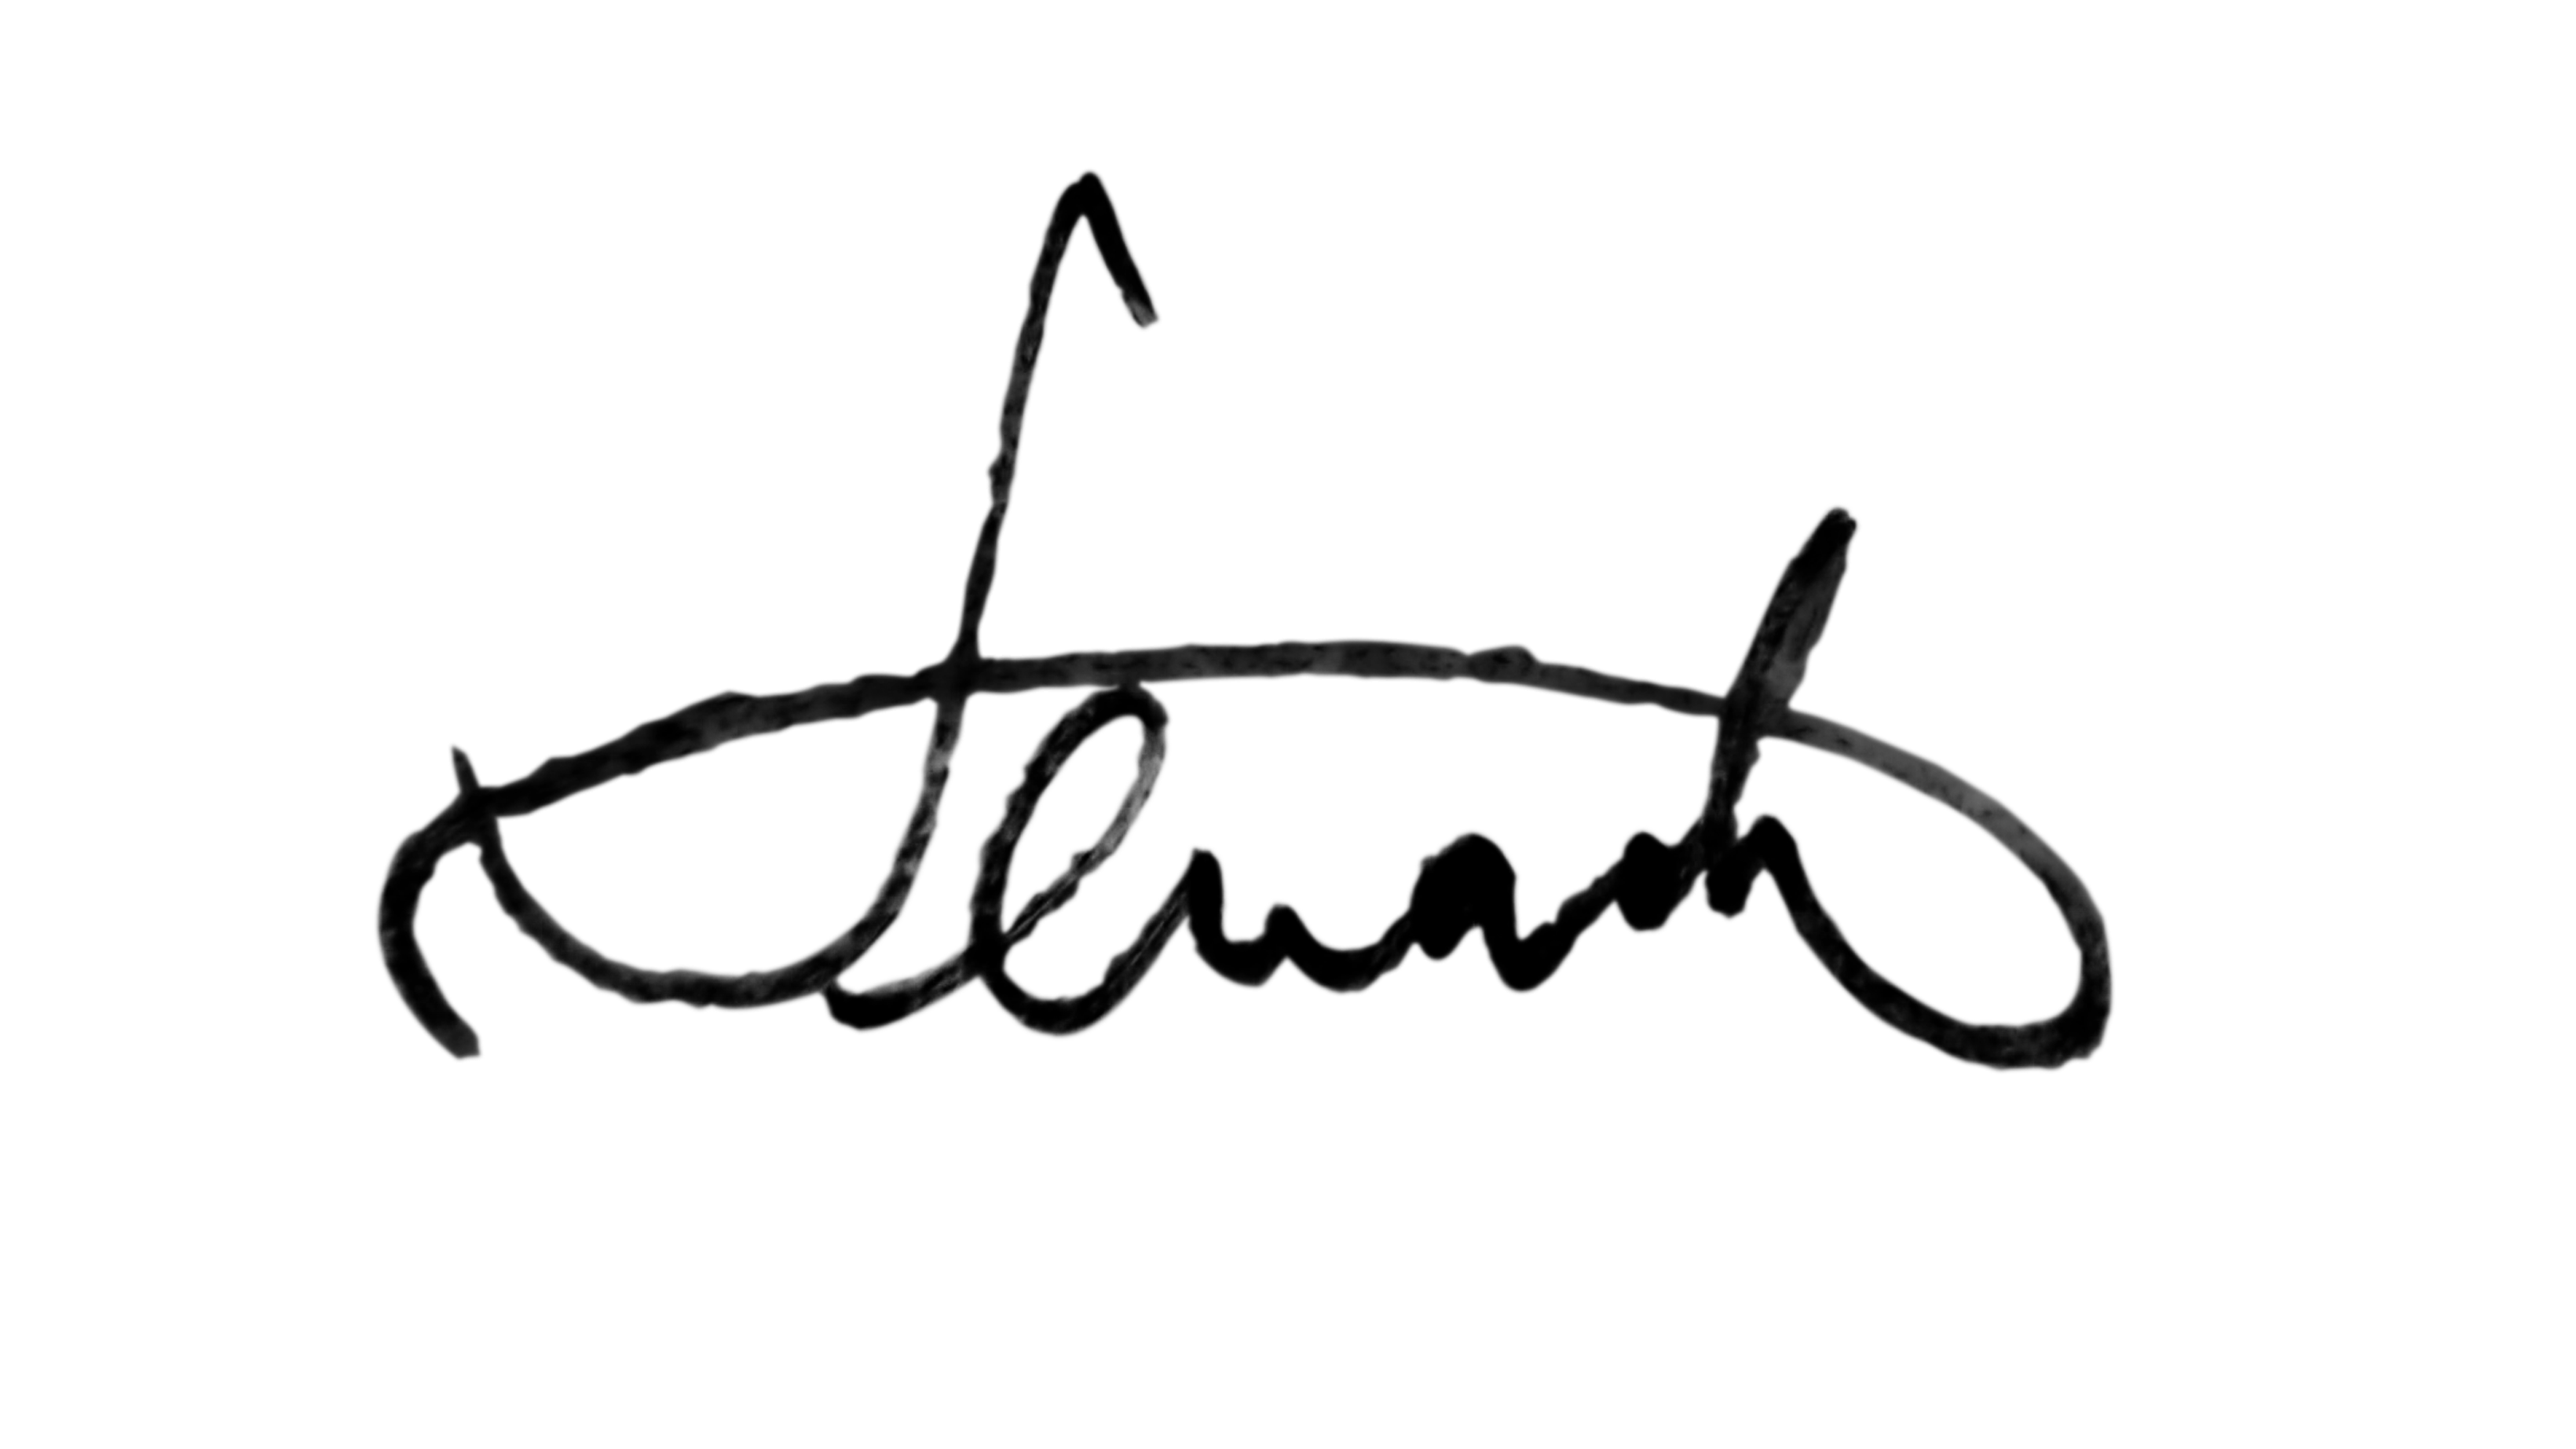 Sonia Enache's Signature